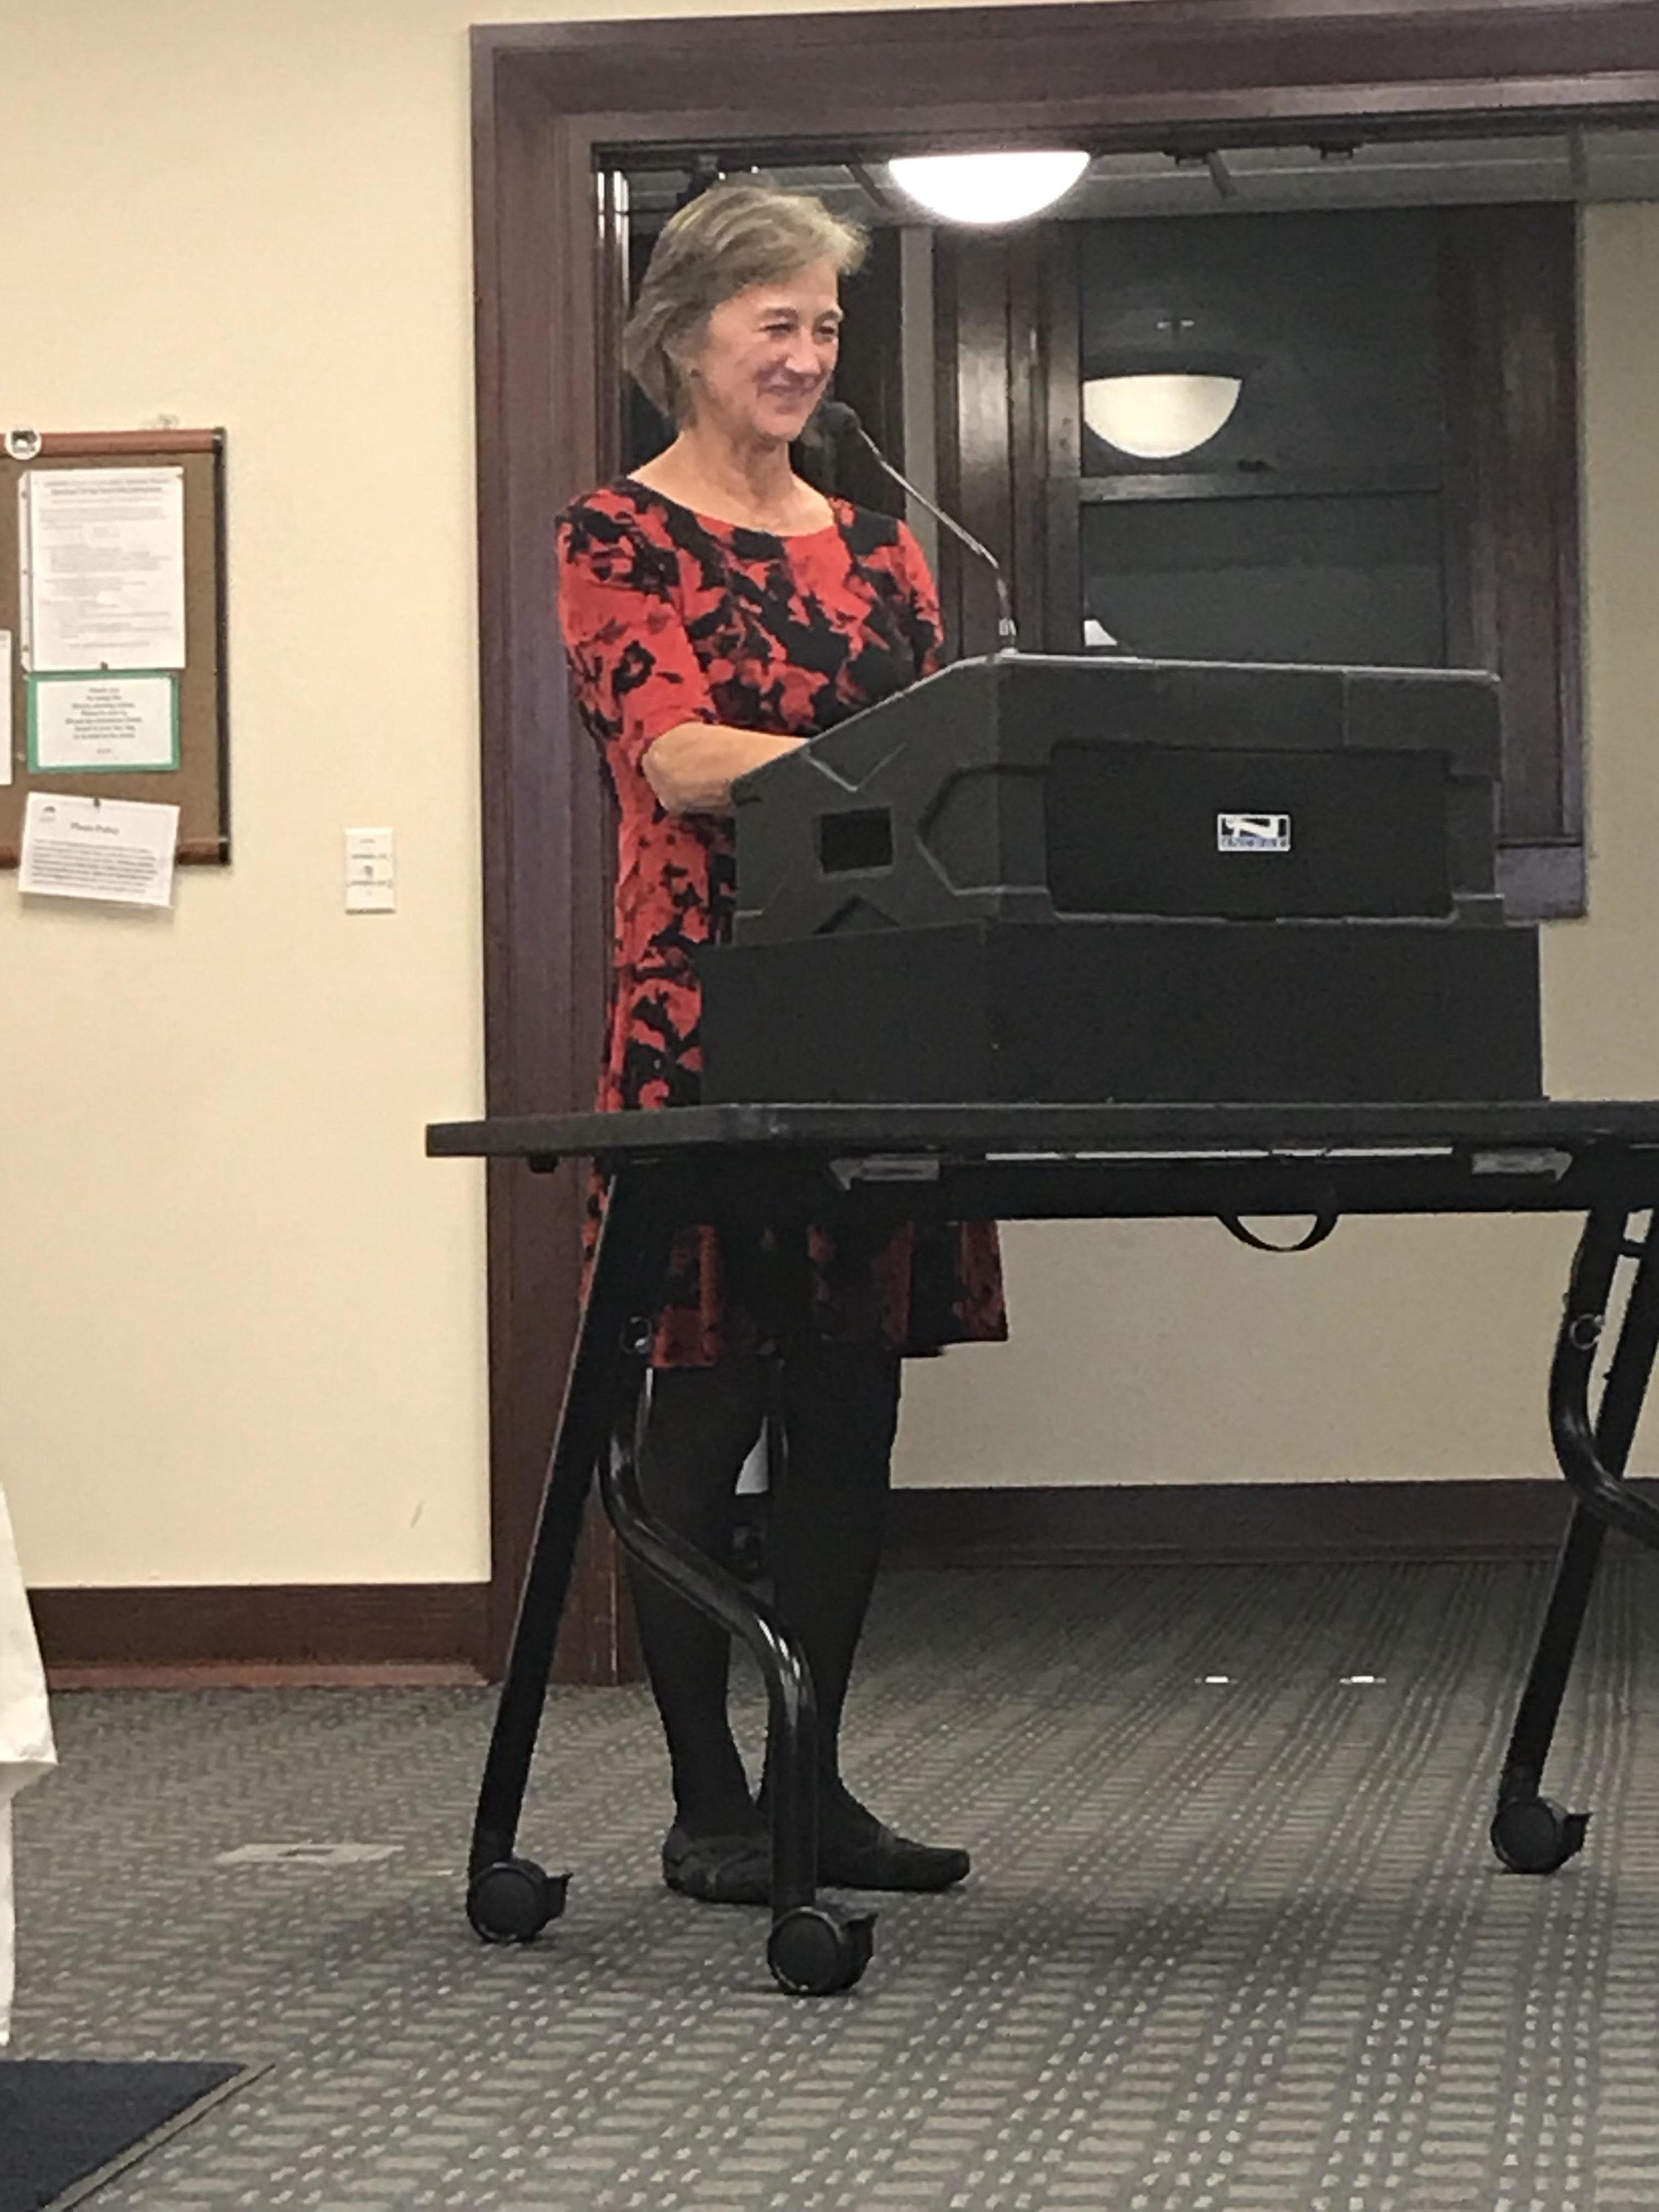 Amy Blossom, former Ashland Branch Manager